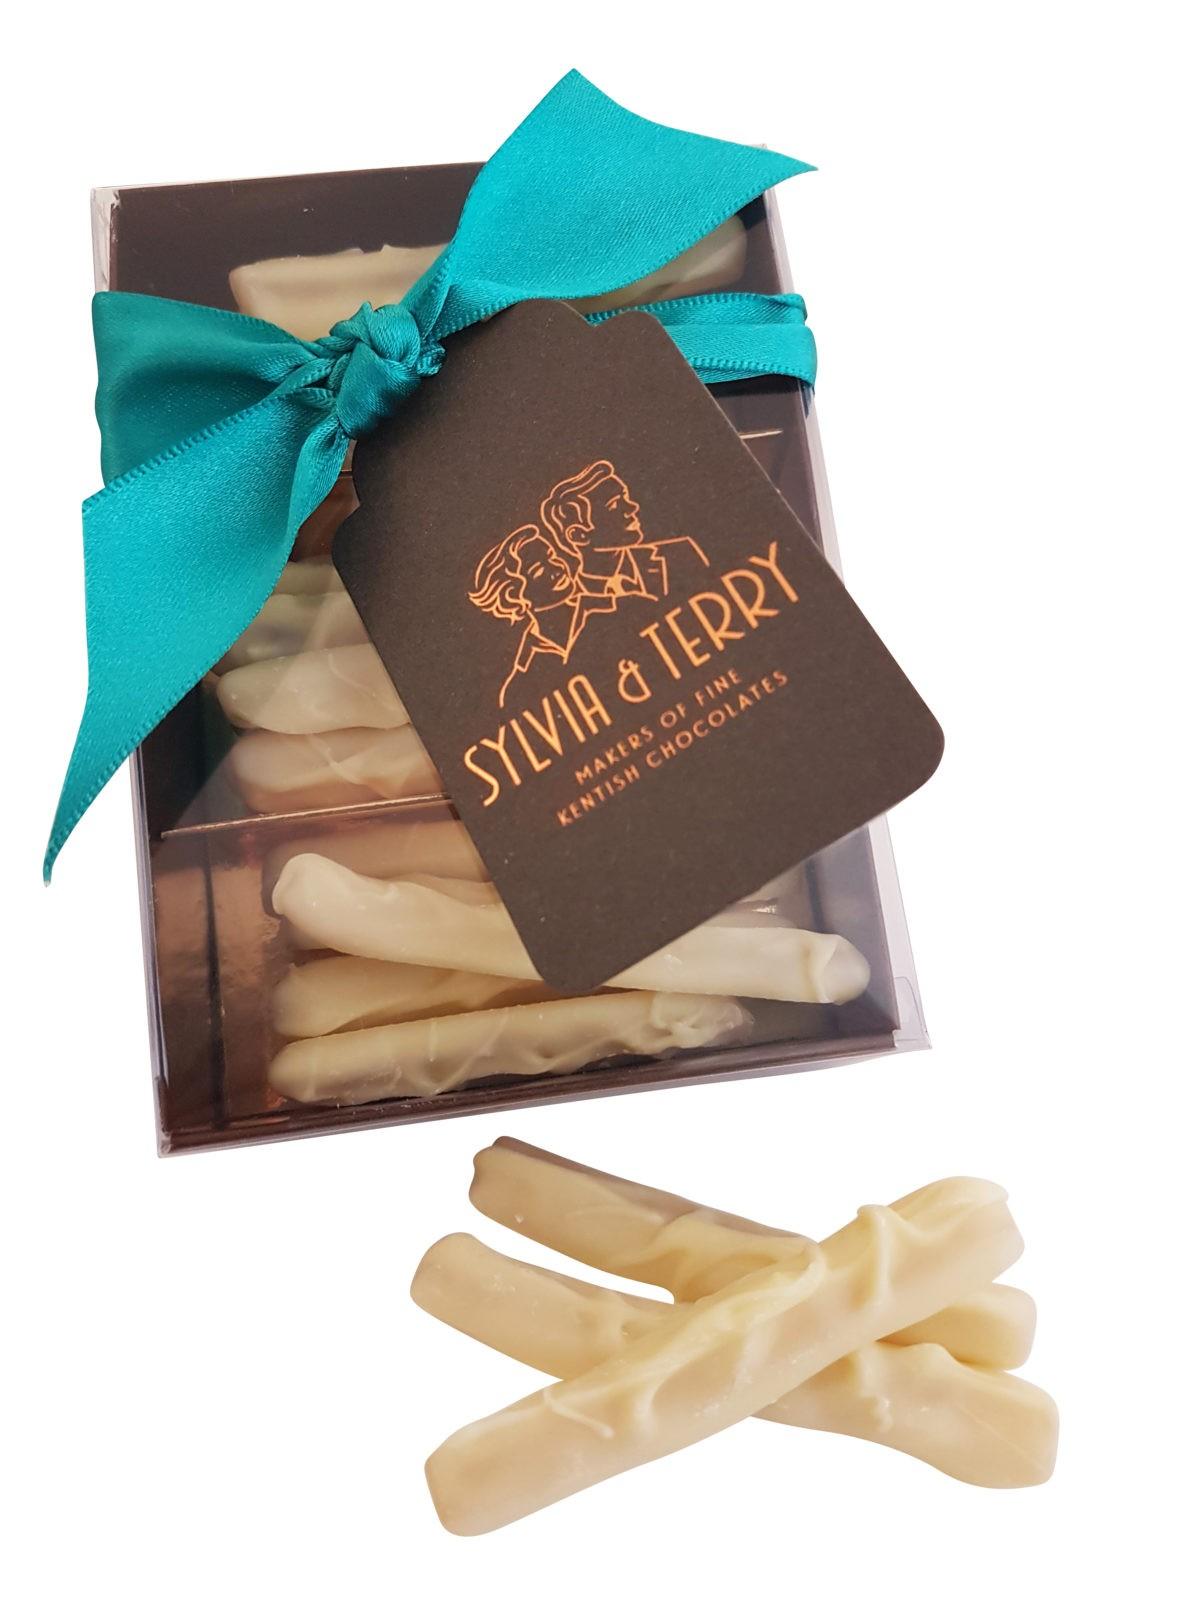 Lemon confit giftbox